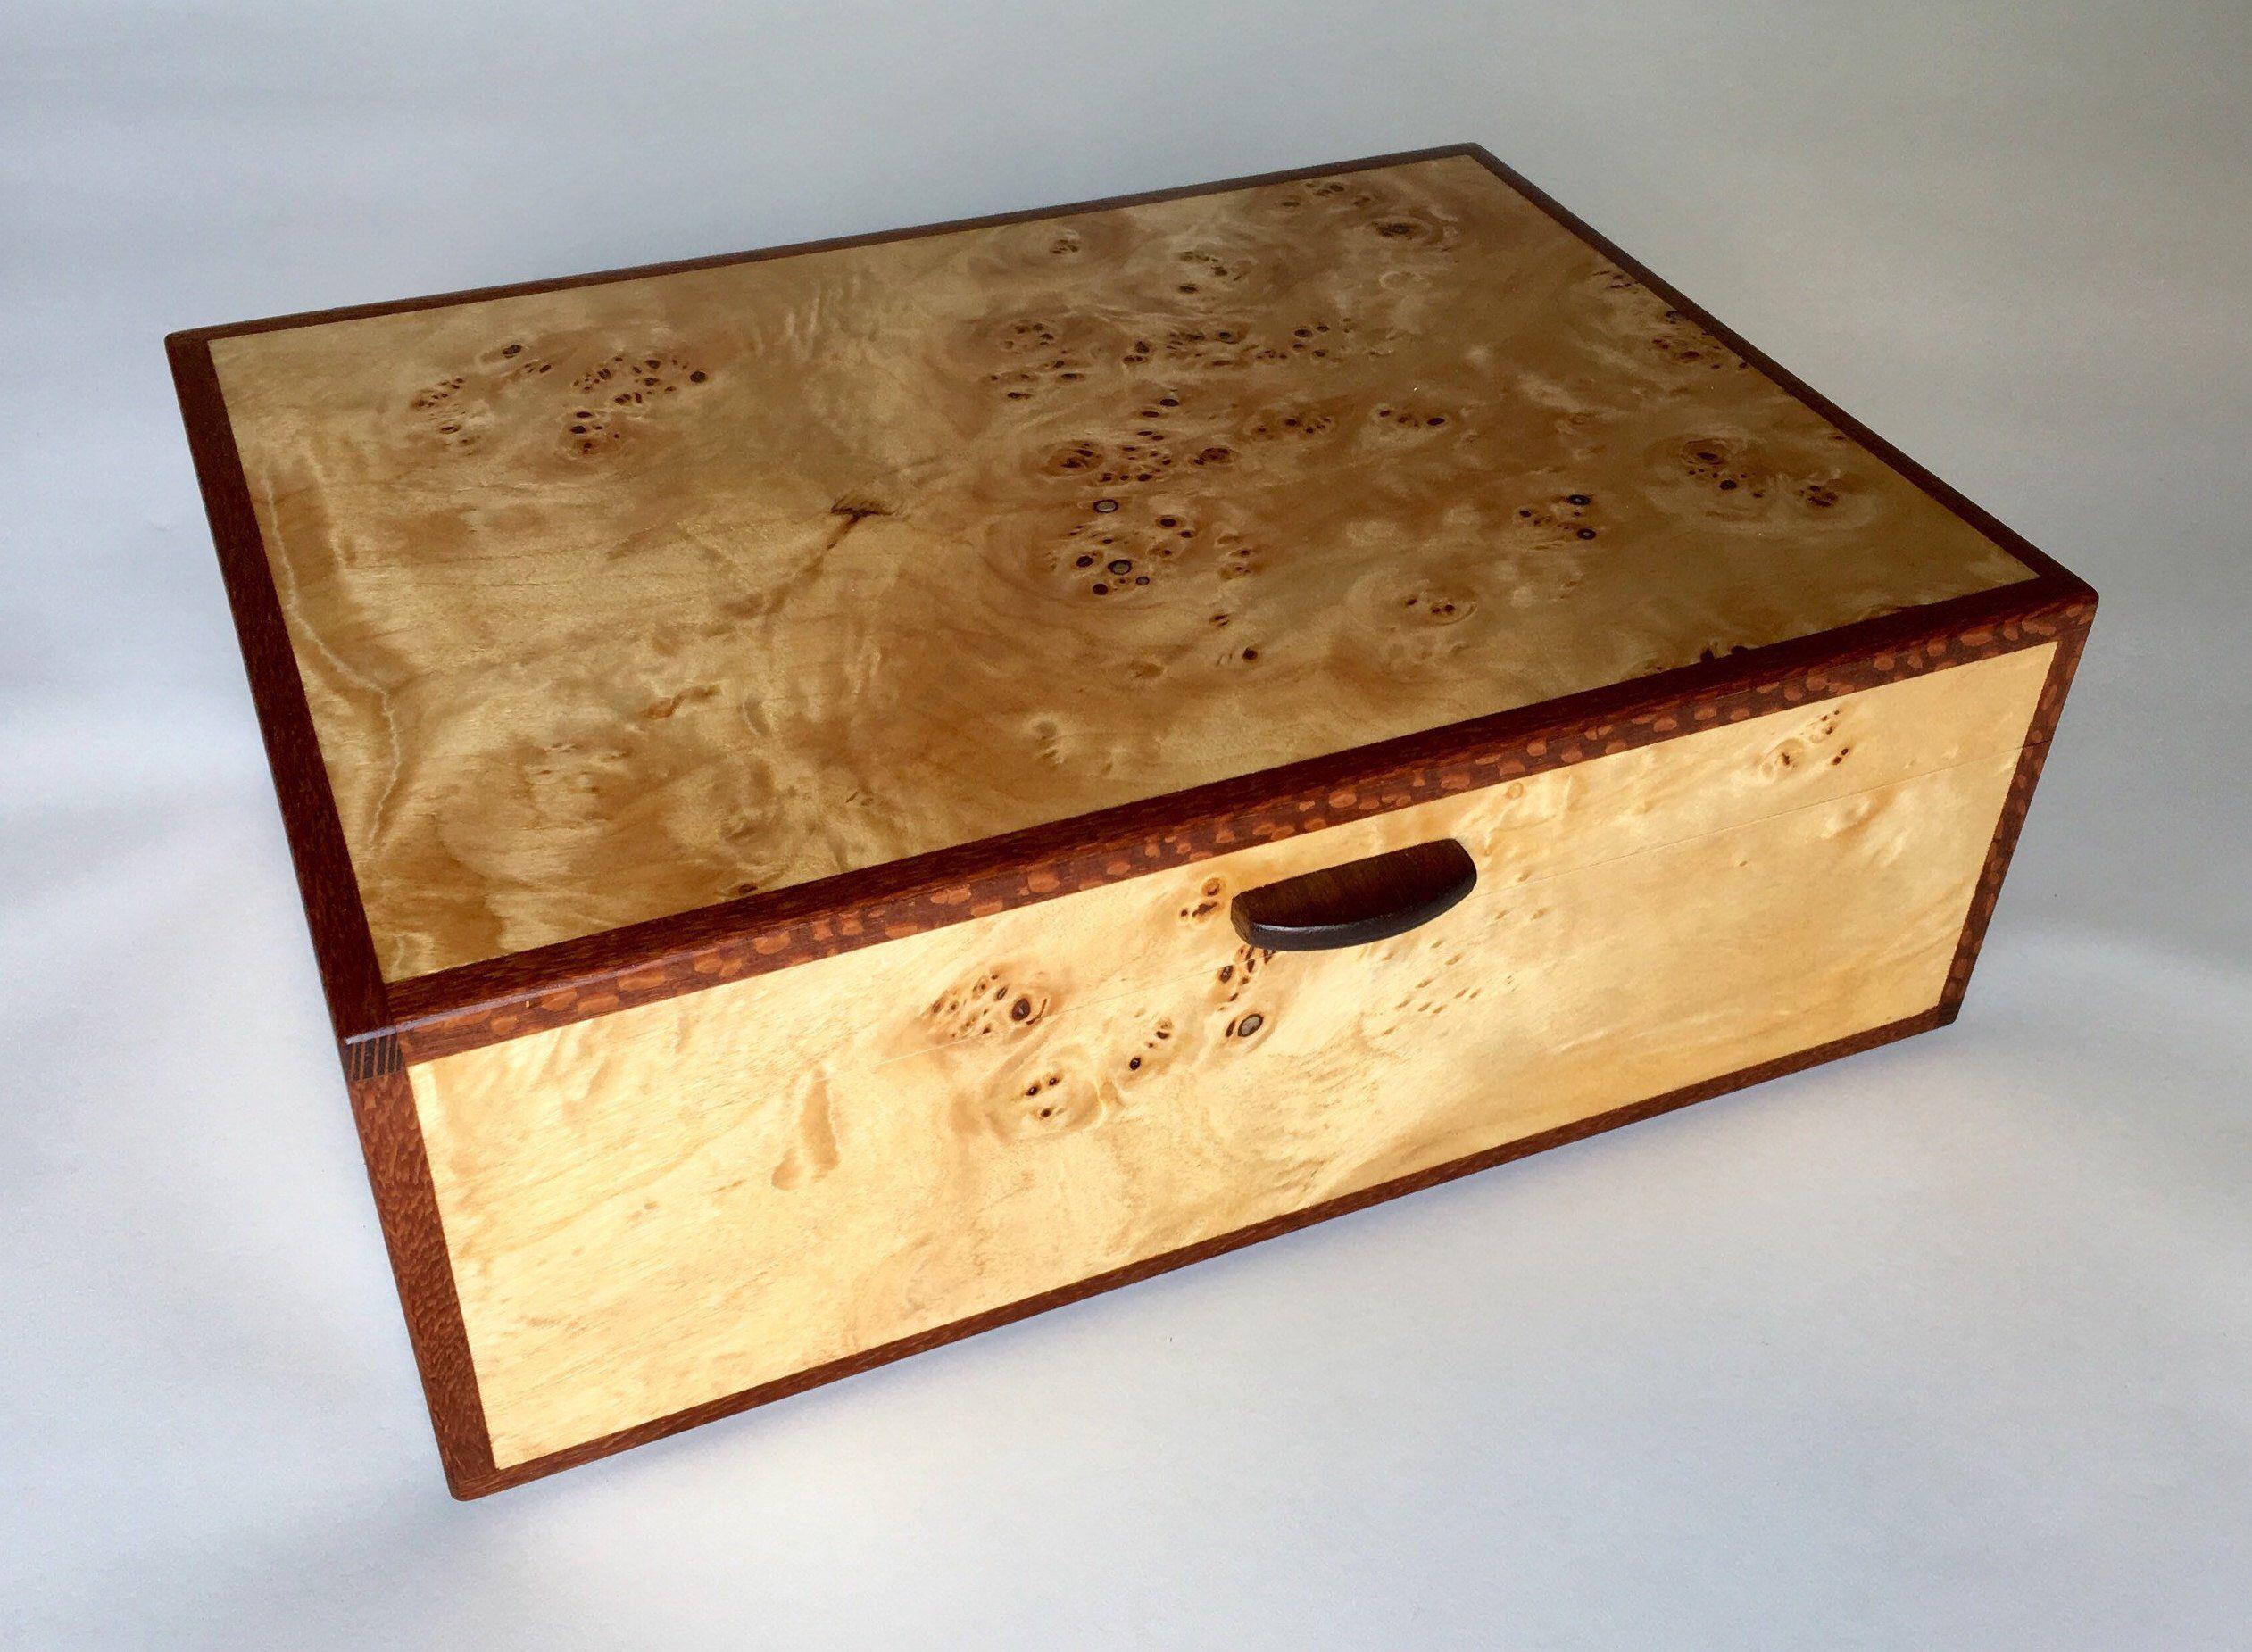 Italian Mappa Wooden Jewelry Box Keepsake Box Man S Valet Box By Austinfinewoodworks On Etsy Https Www Ets Wooden Jewelry Boxes Wooden Boxes Decorative Boxes